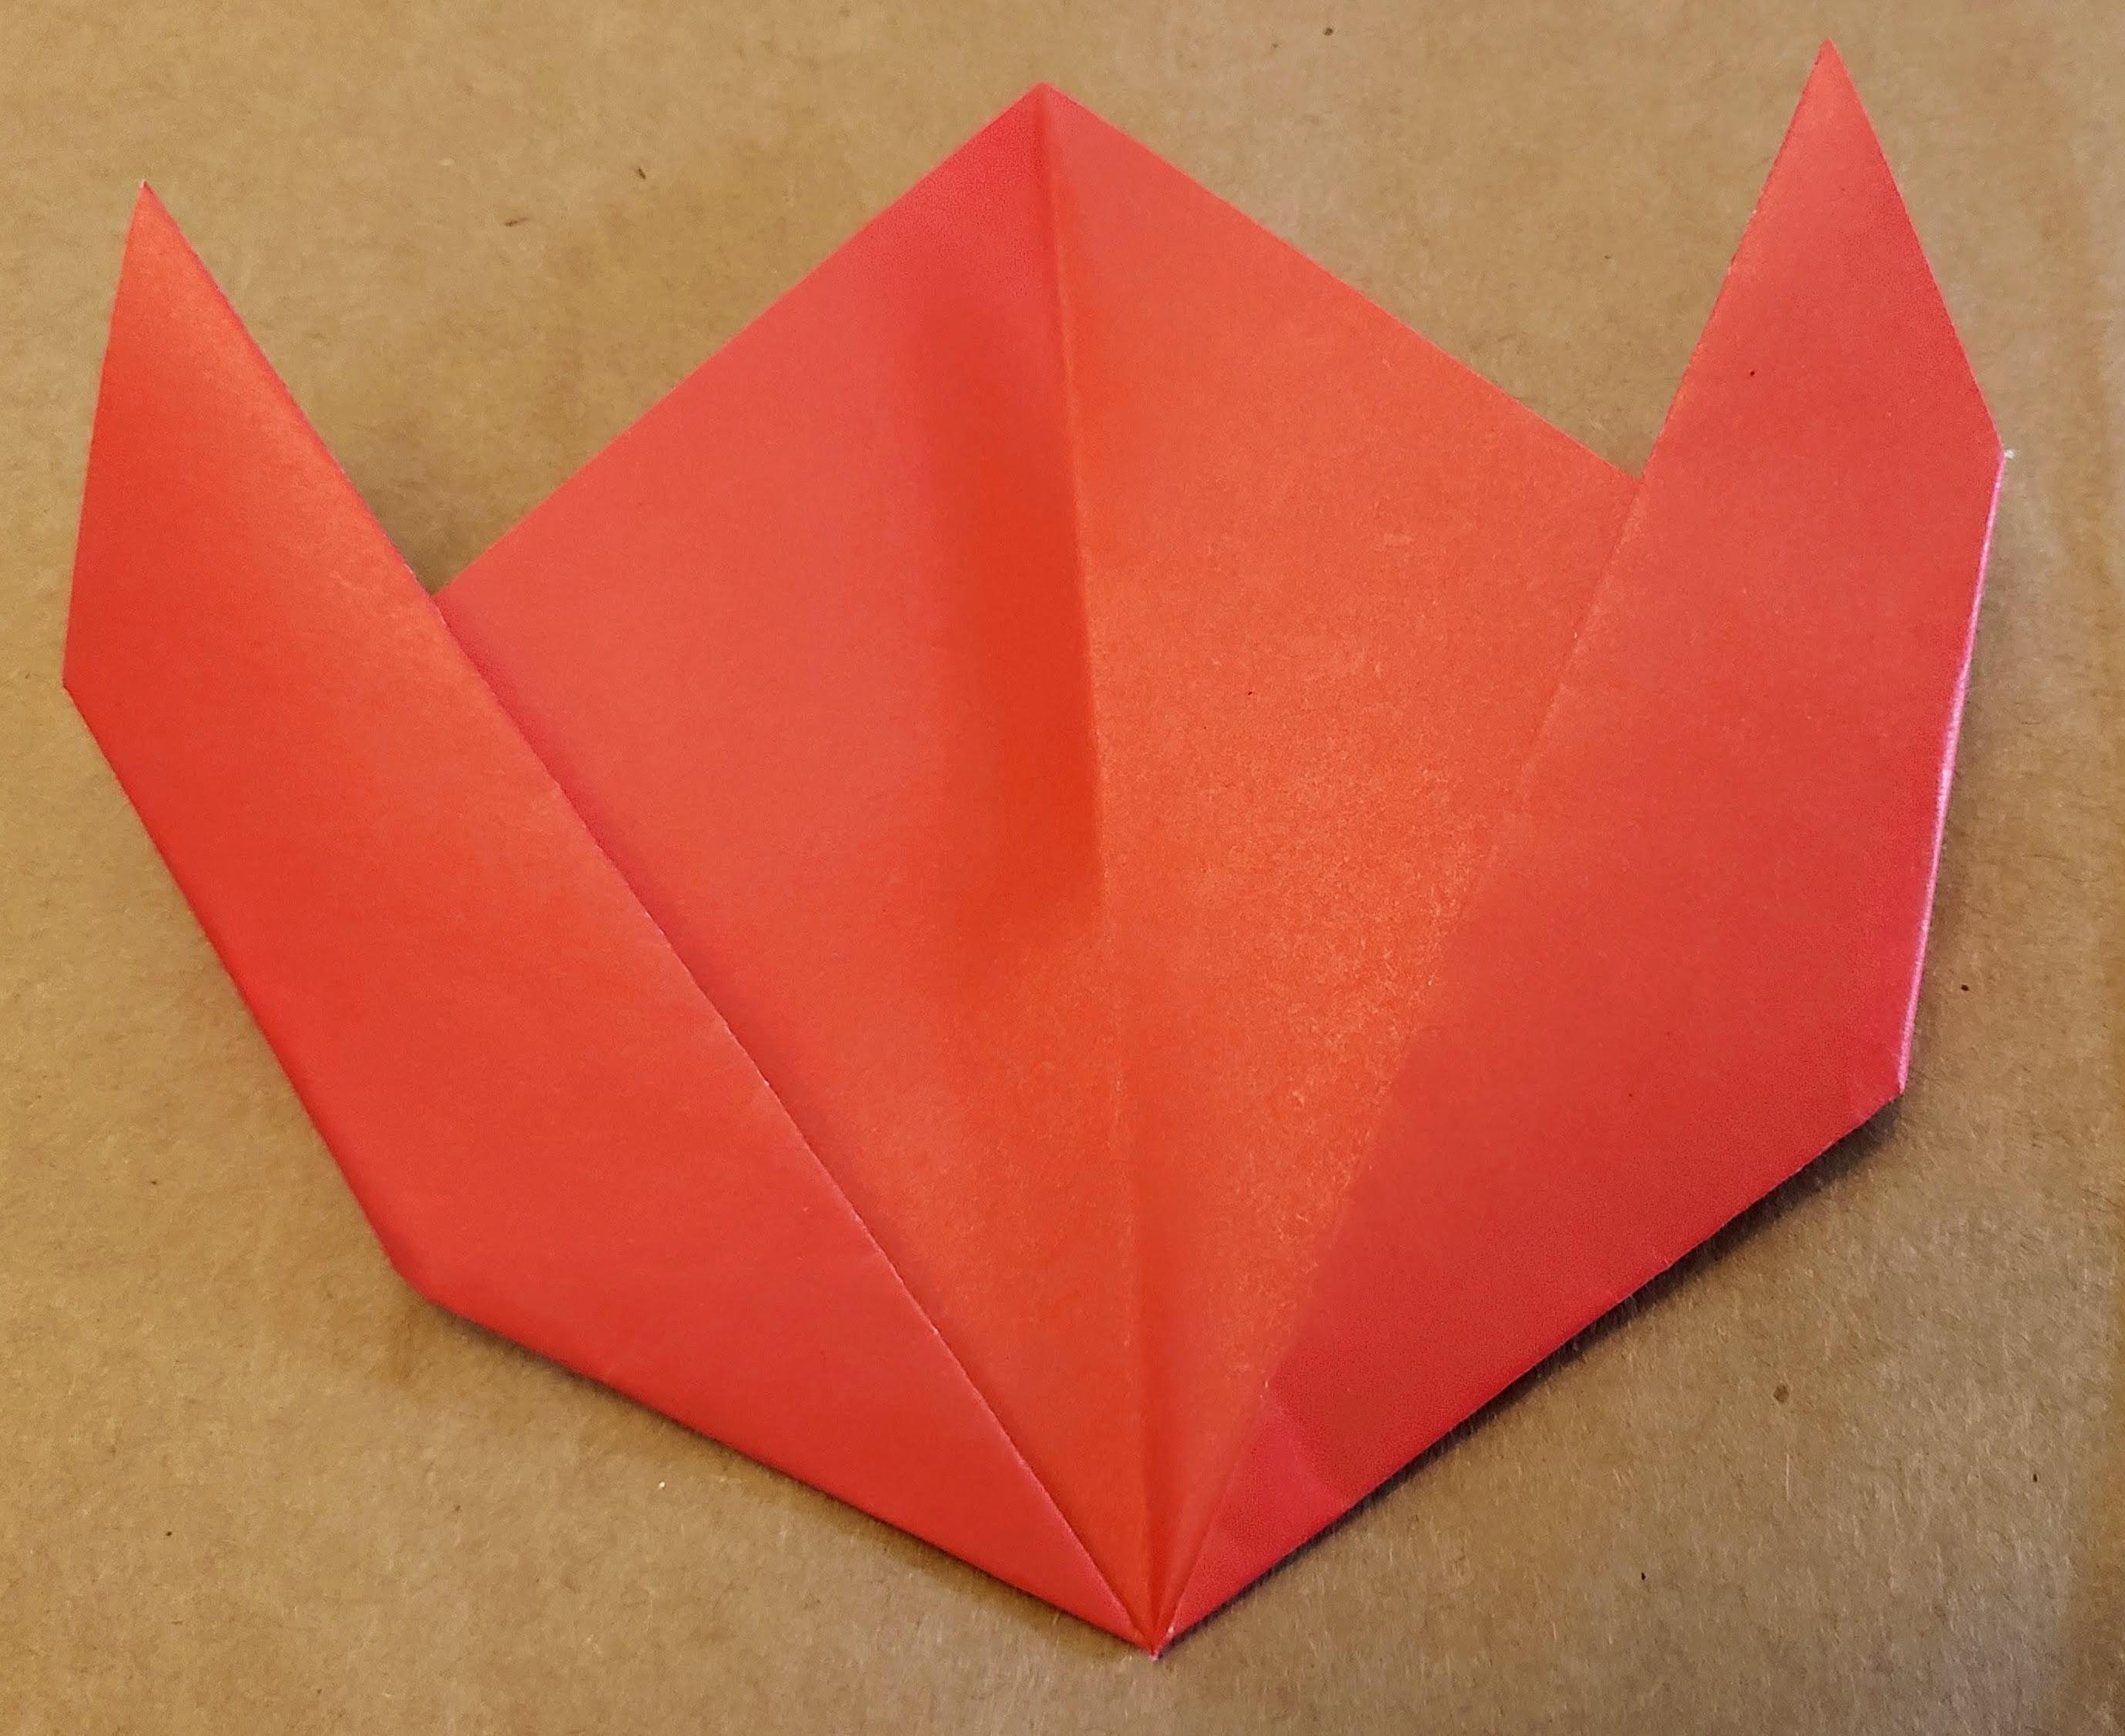 Origami - Wikipedia | 2254x2759